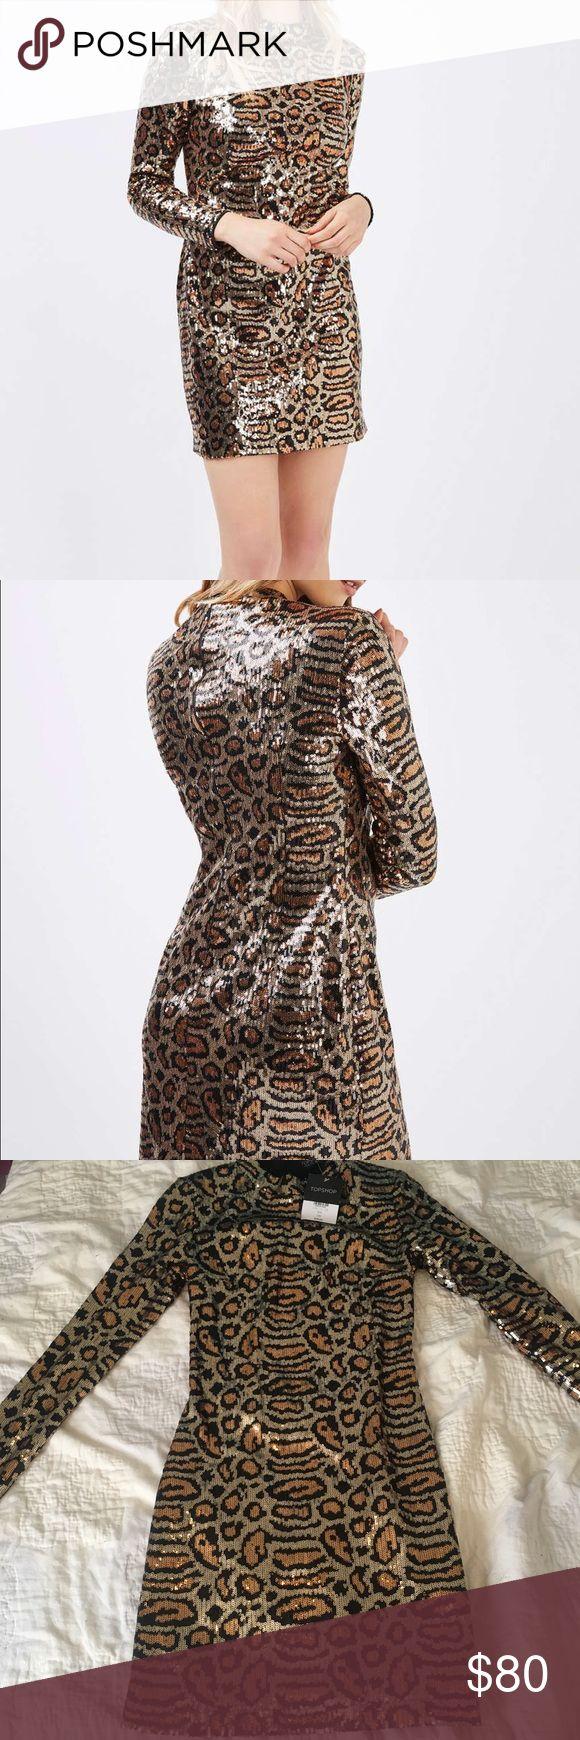 NWT Topshop Animal Print Sequin Dress. Size US 2 NWT Topshop Sequin Dress. Great for a night out! Topshop Dresses Long Sleeve